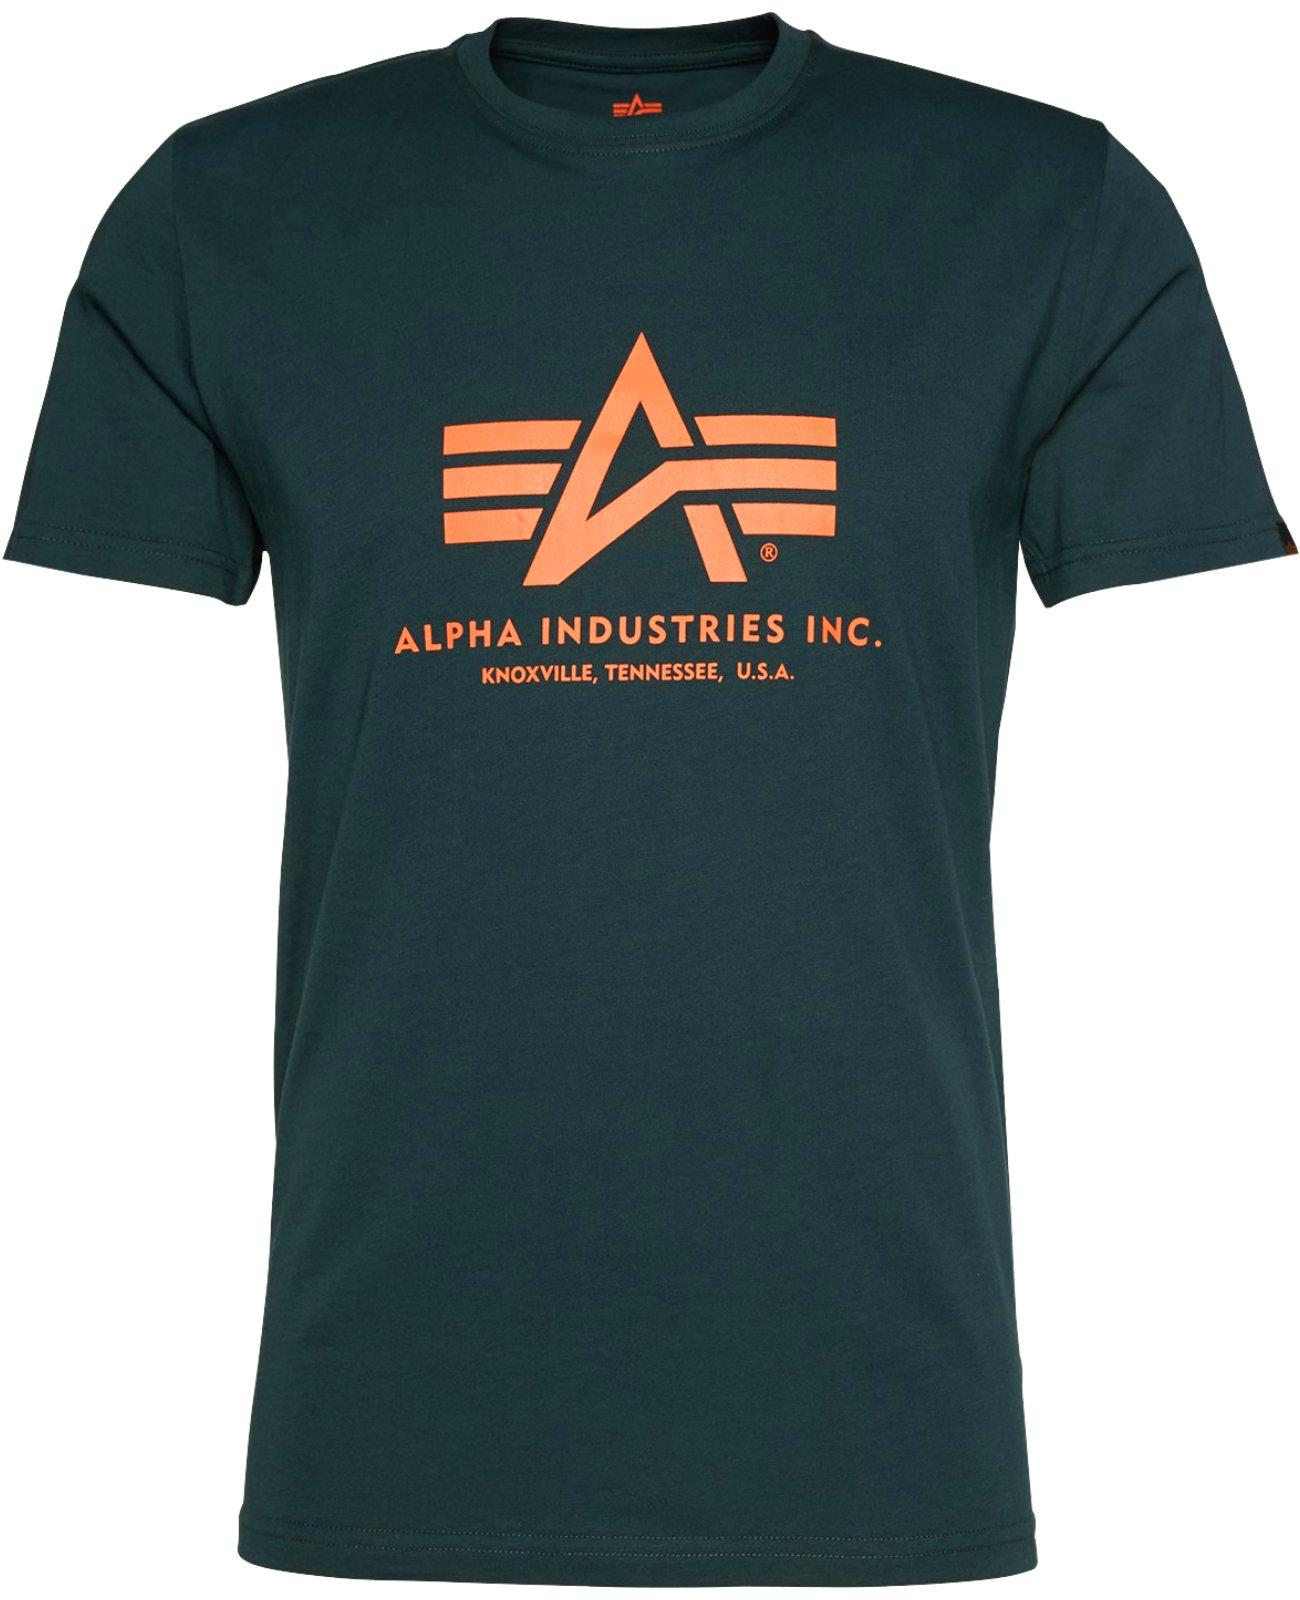 47fc15c90d91 Alpha Industries Herren Basic T-Shirt Shirt Neue Farben Sommer ...